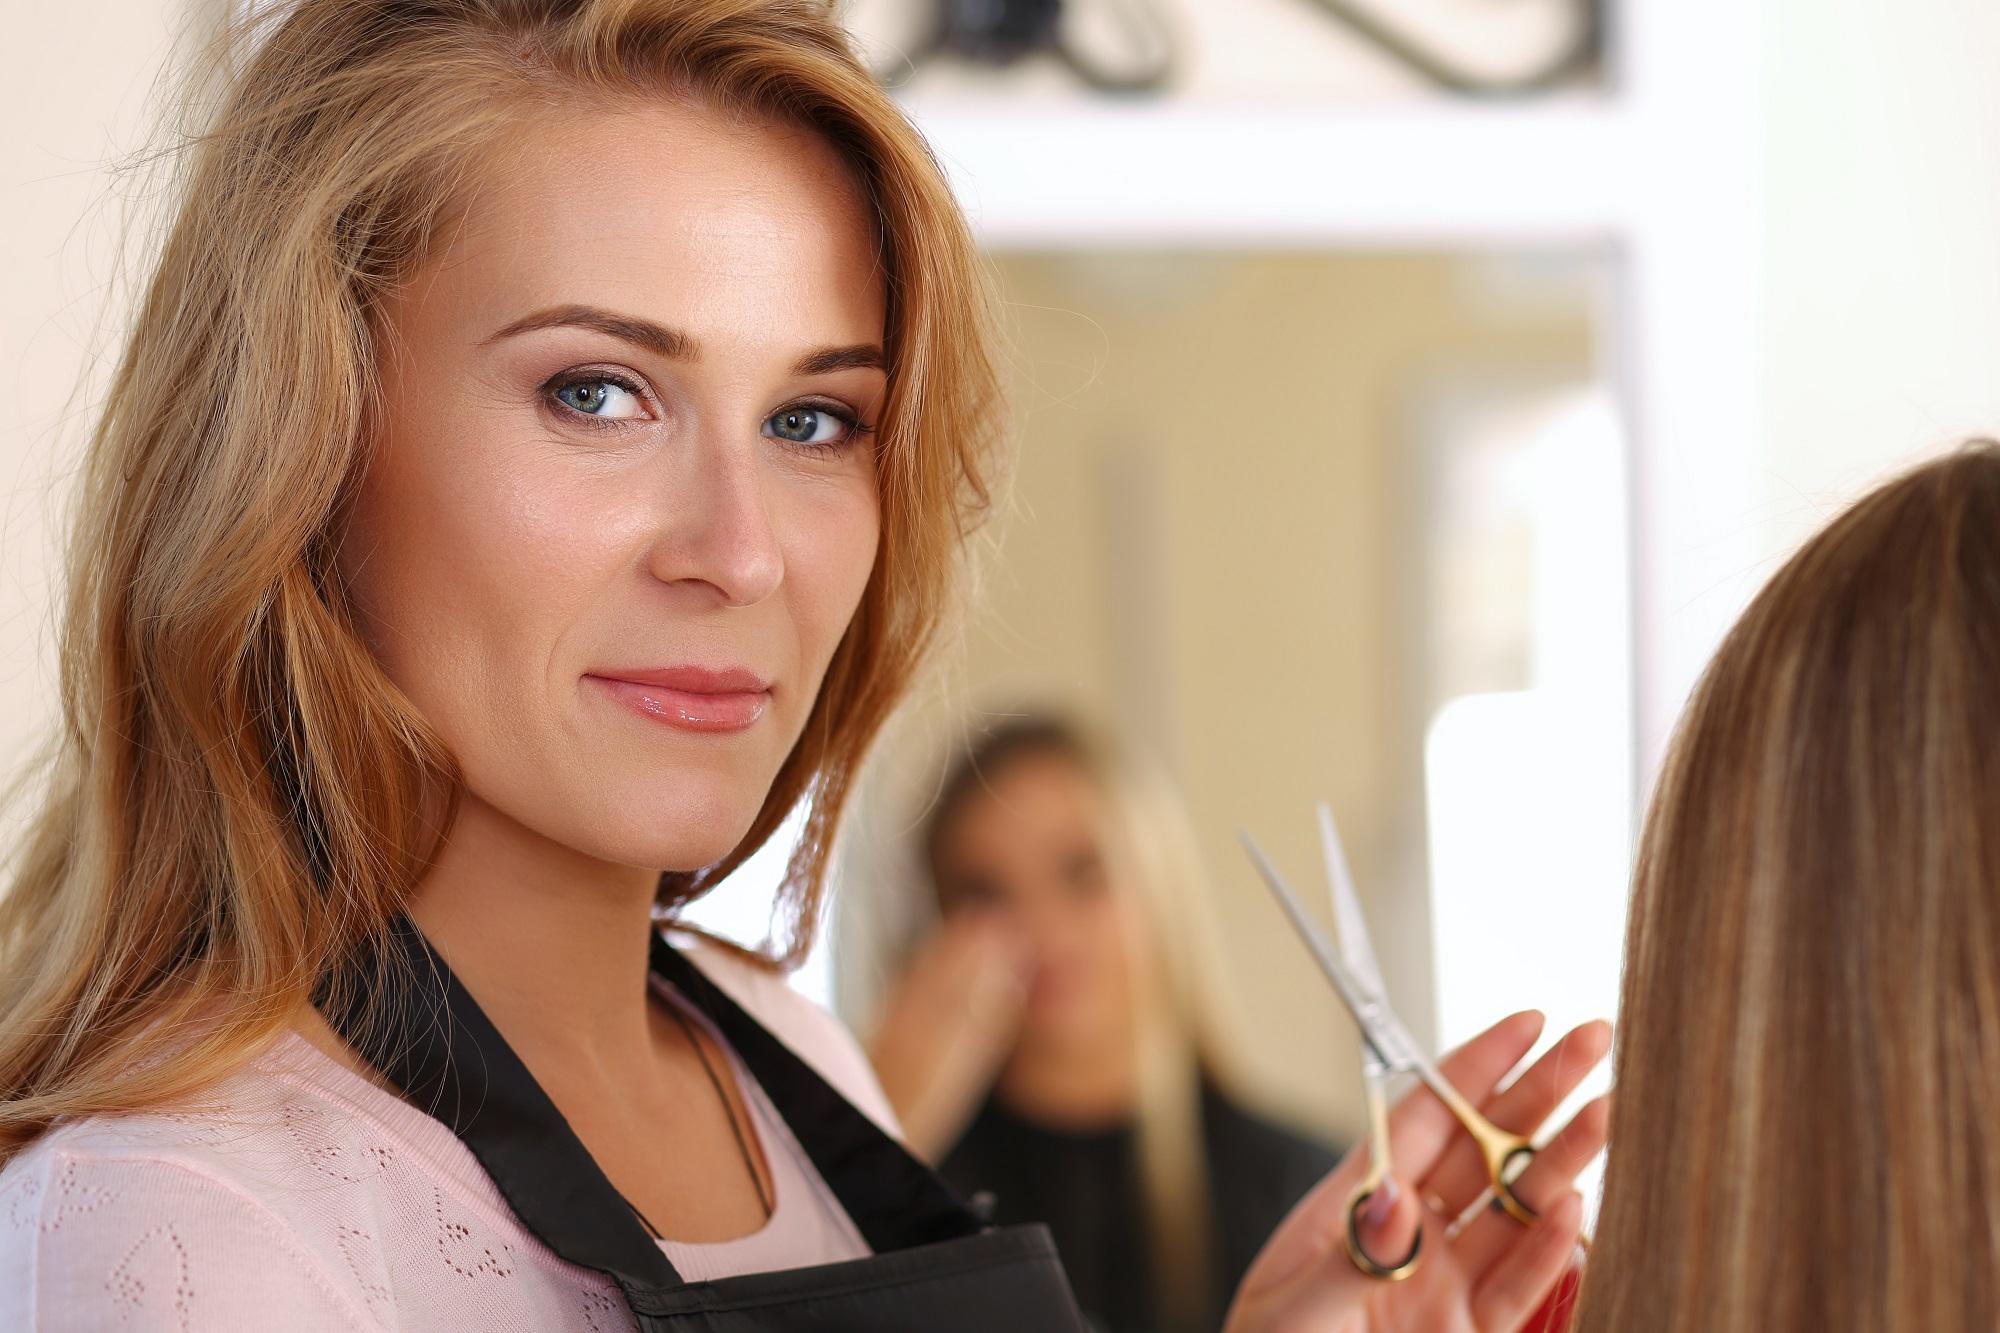 Стрижка волос по лунному календарю. Источник фото: Shutterstock